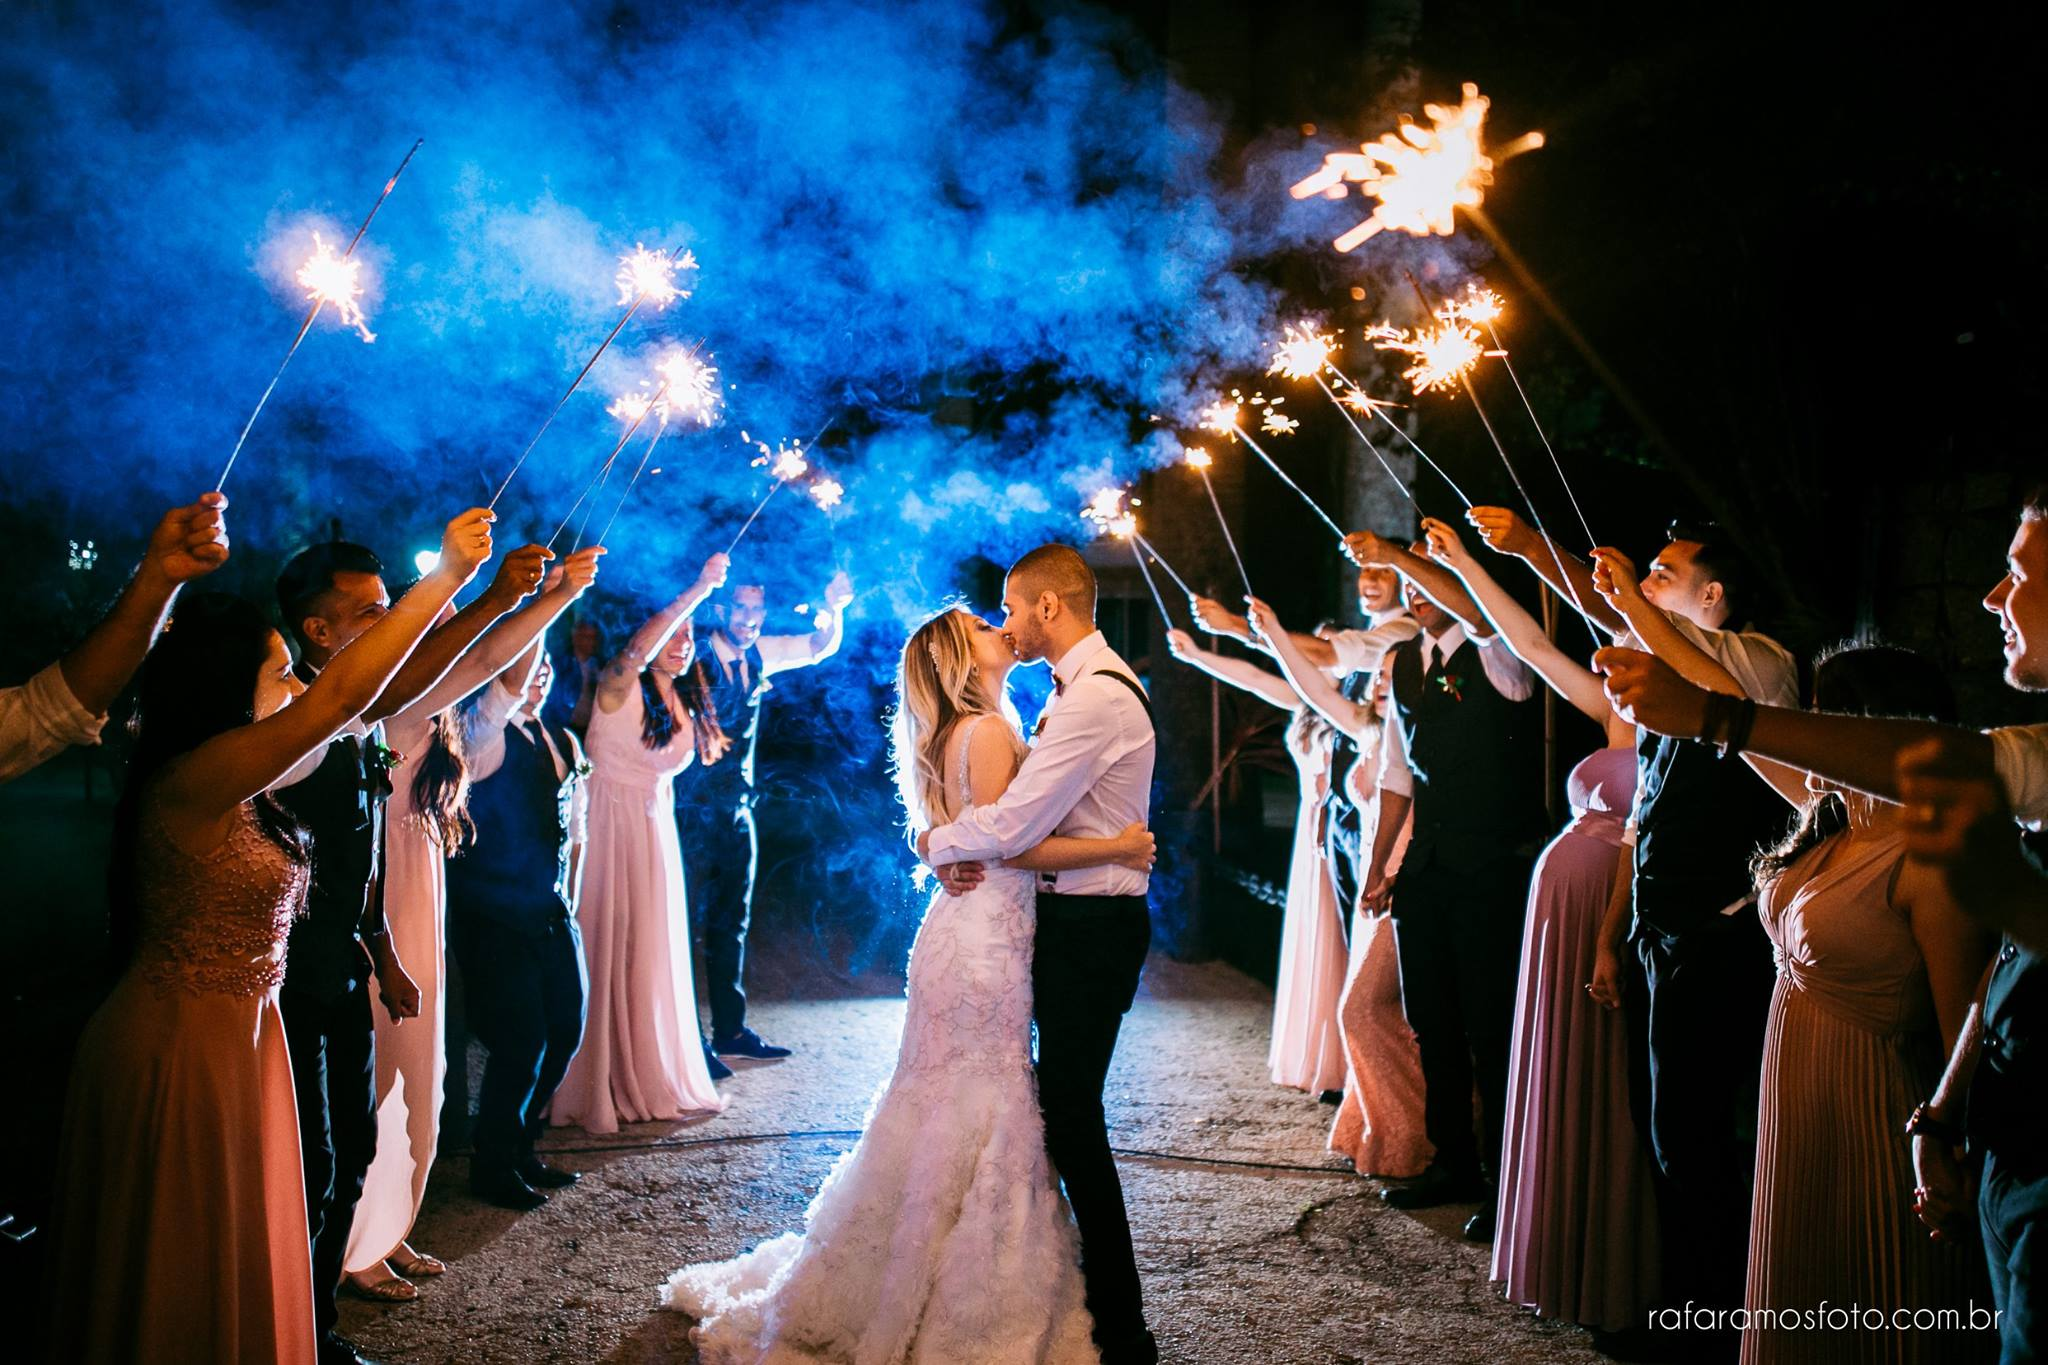 casamento boho chic casamento ao ar livre inspiracao roupa noivo terno marsala fotografo de casamento interior sp 1501